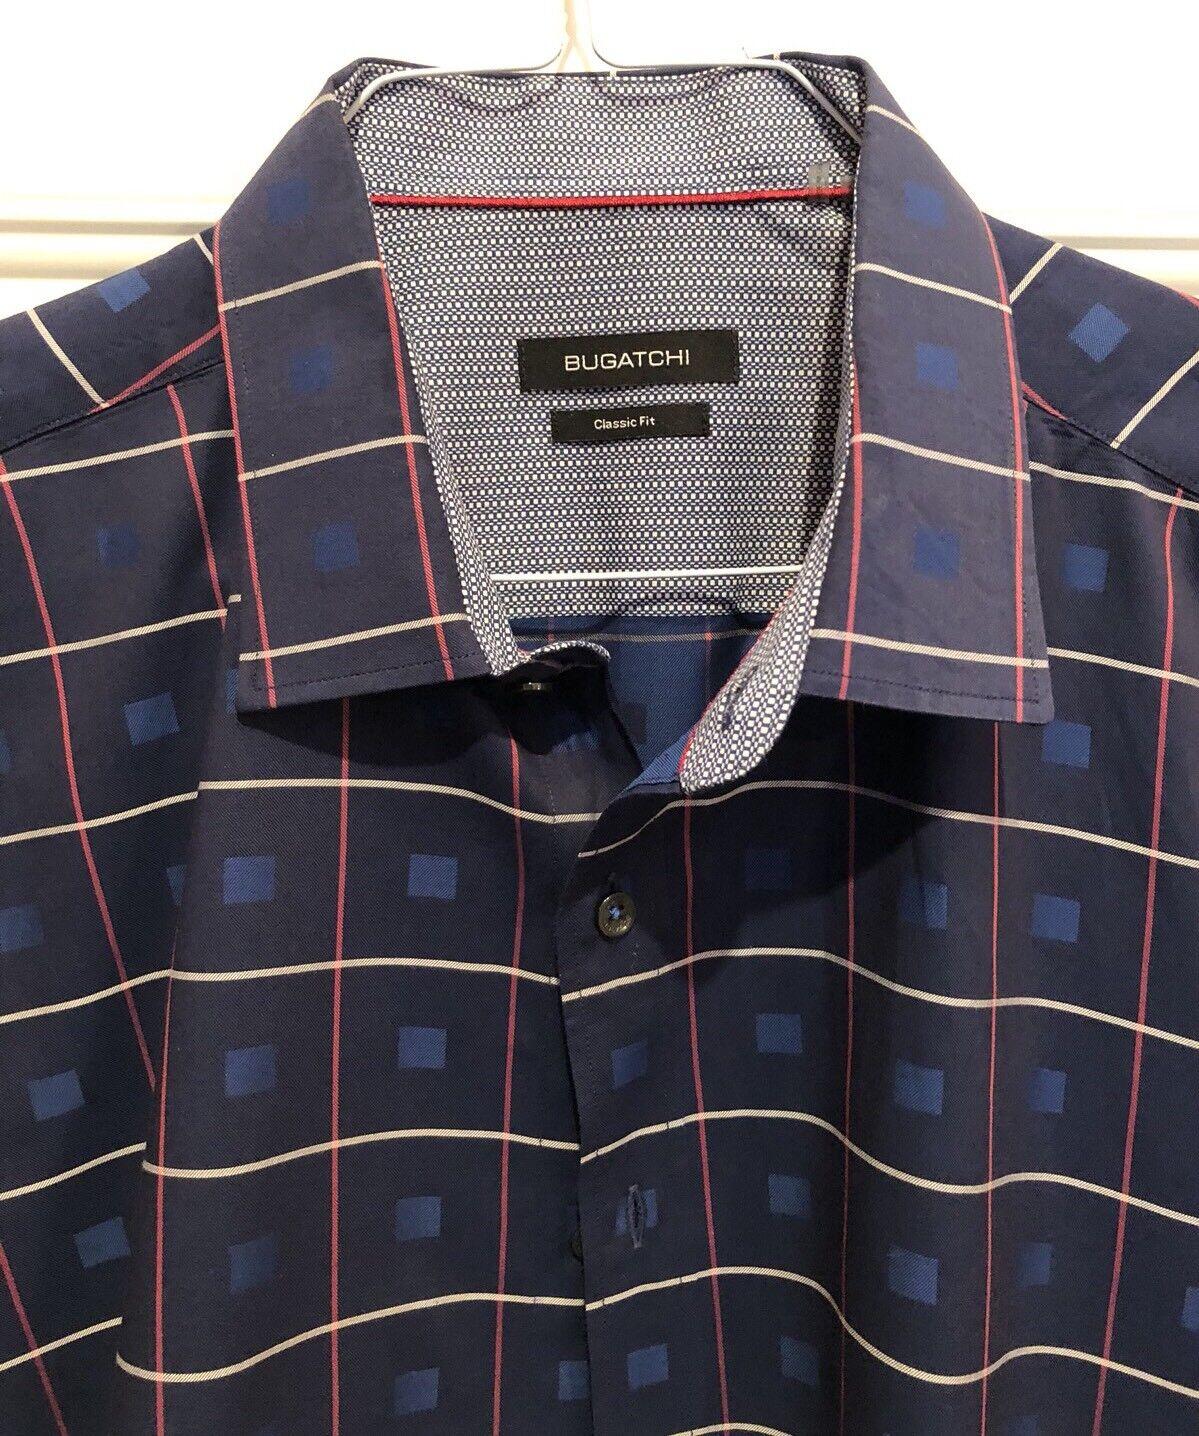 Bugatchi Uomo Uomo Uomo Shirt Size XXL Classic Fit Button Down contrast Cuff 0d0937